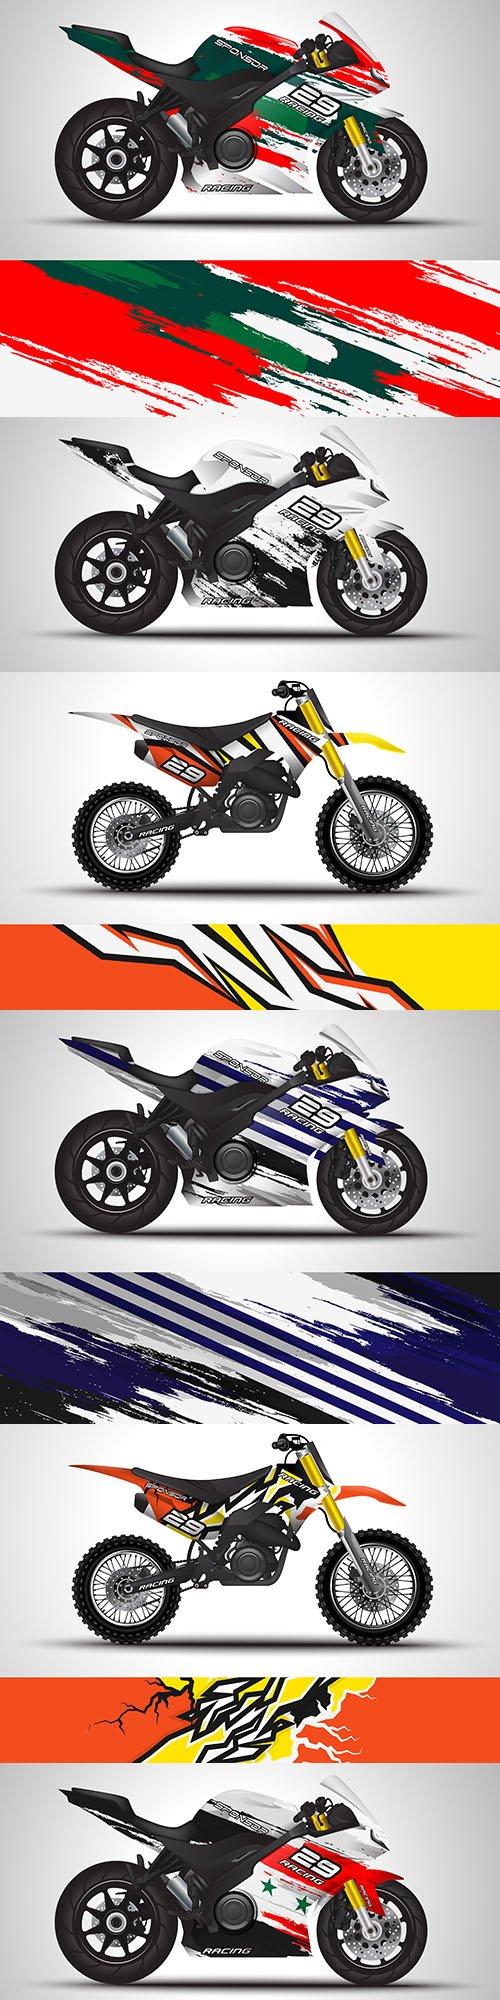 Motorcycle sticker and vinyl sticker design illustration